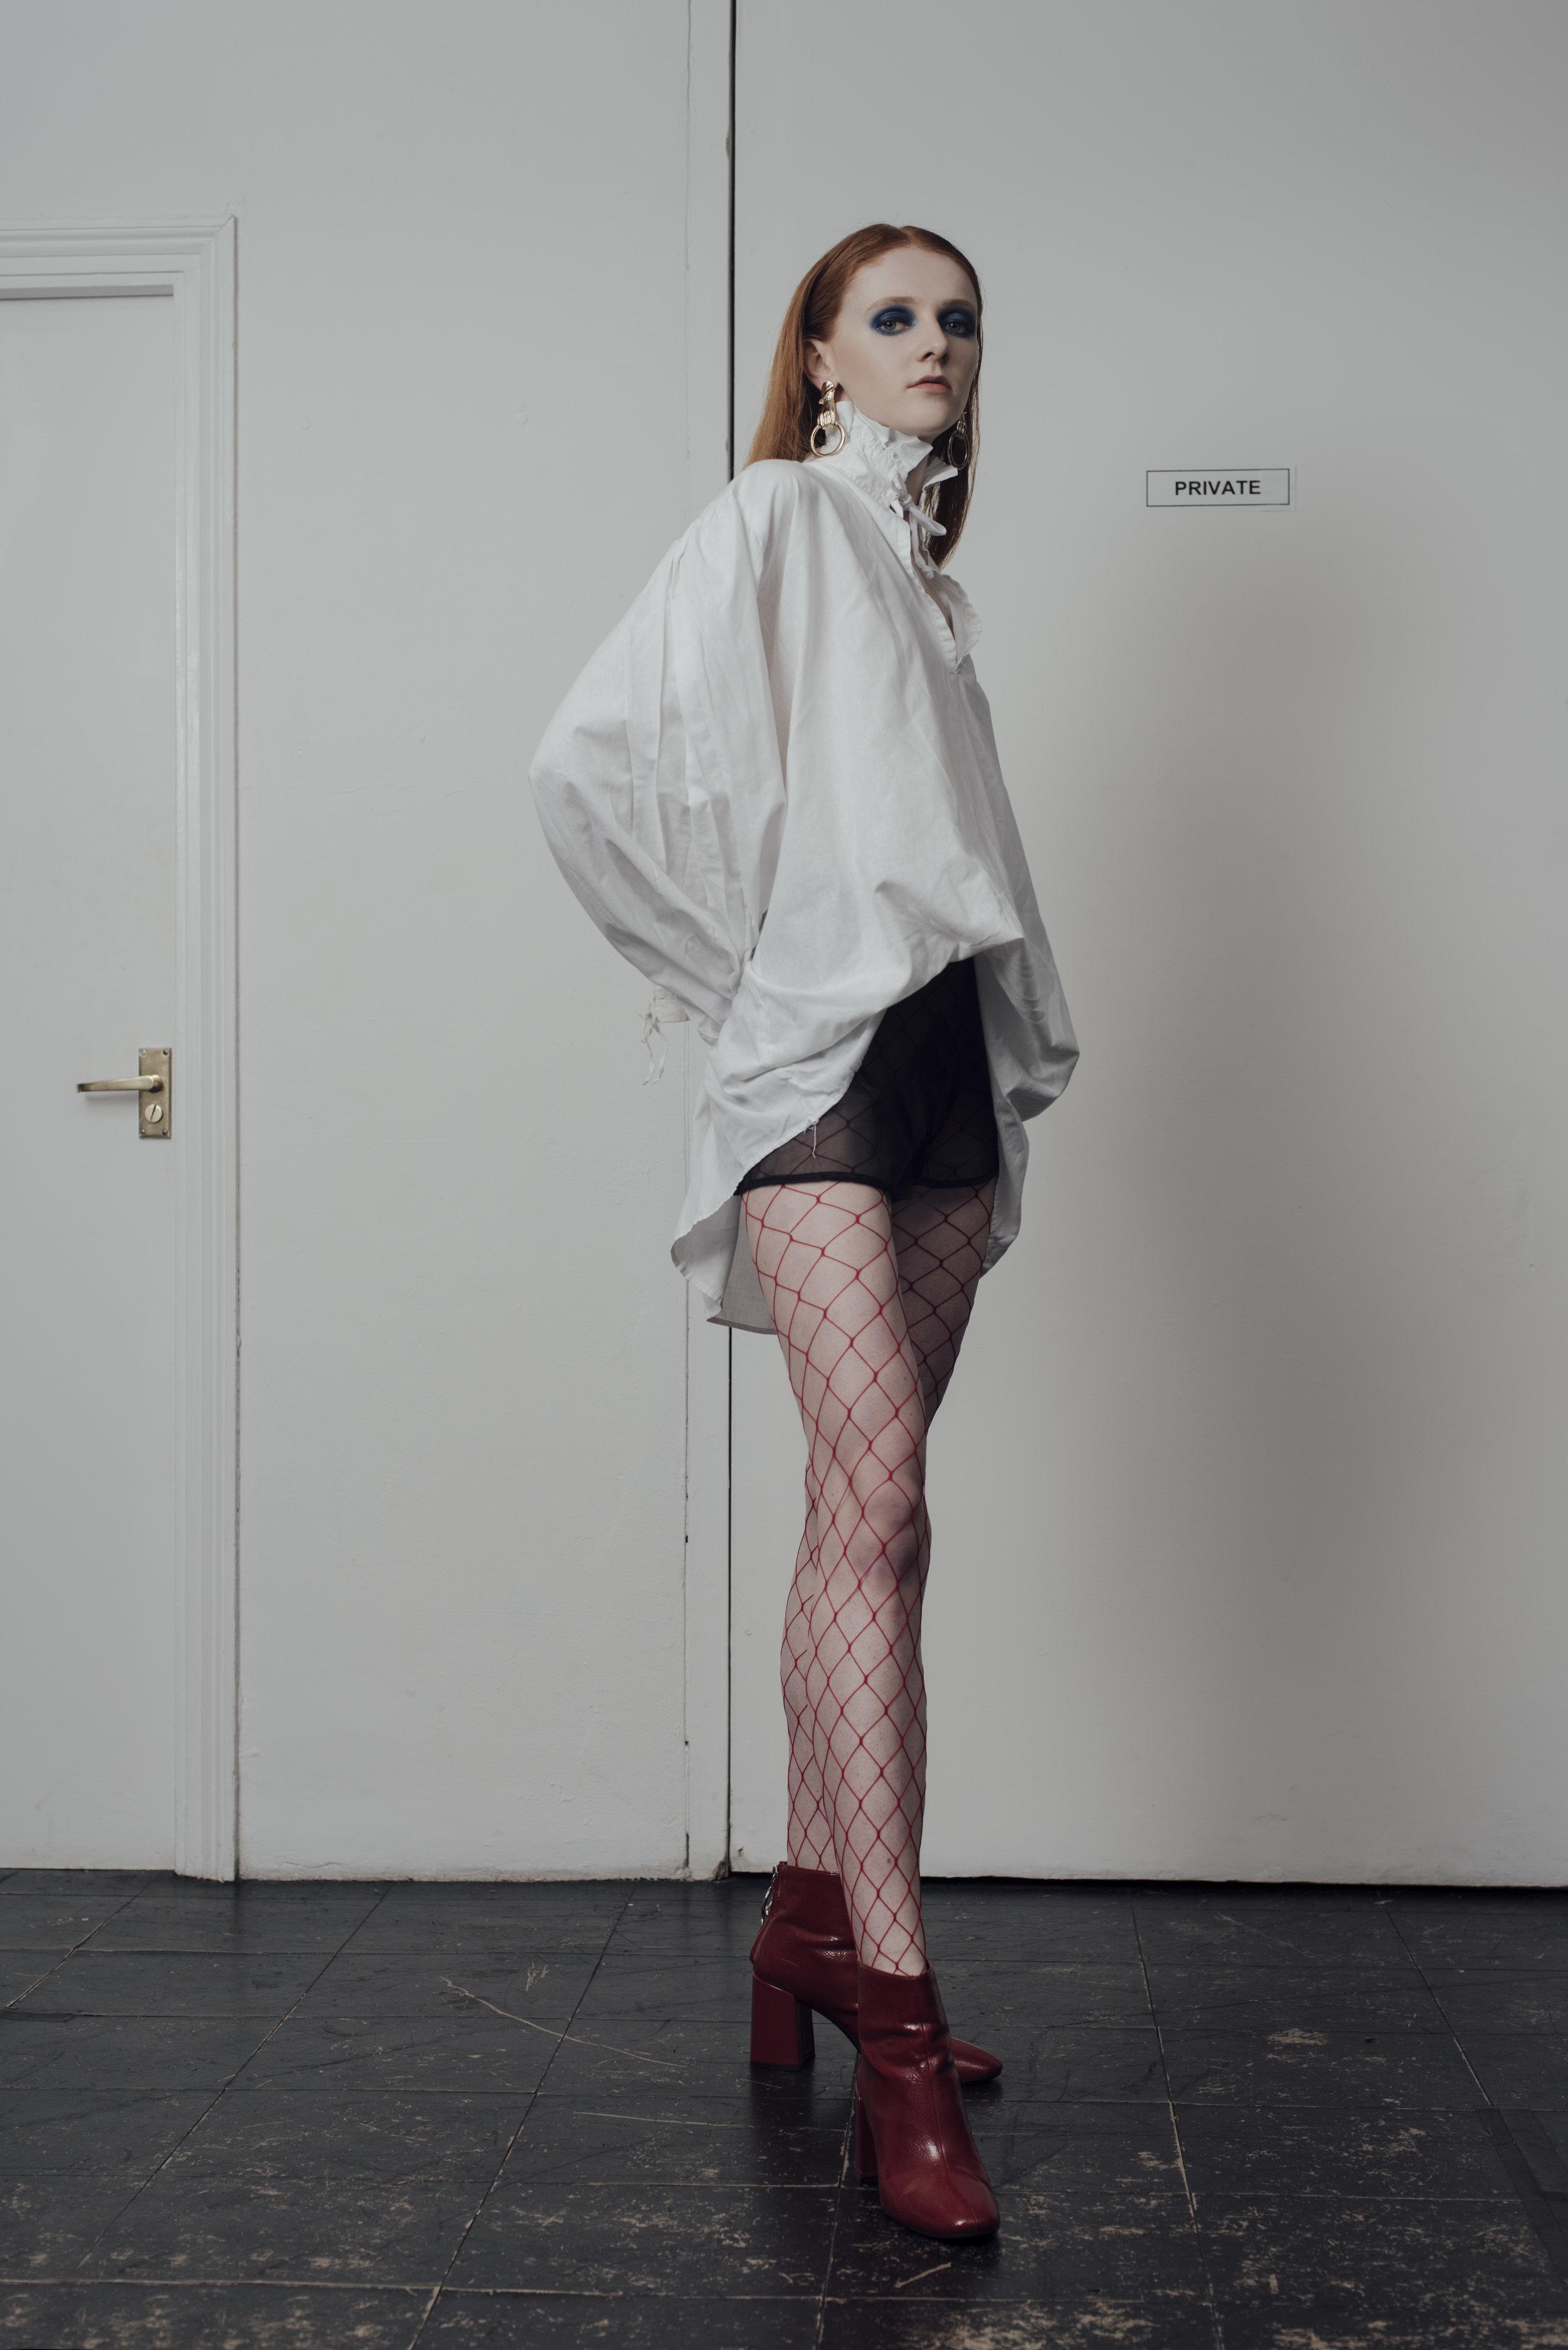 shirt COSTUME STUDIO,,shorts STYLIST'S OWN, boots STYLIST'S OWN